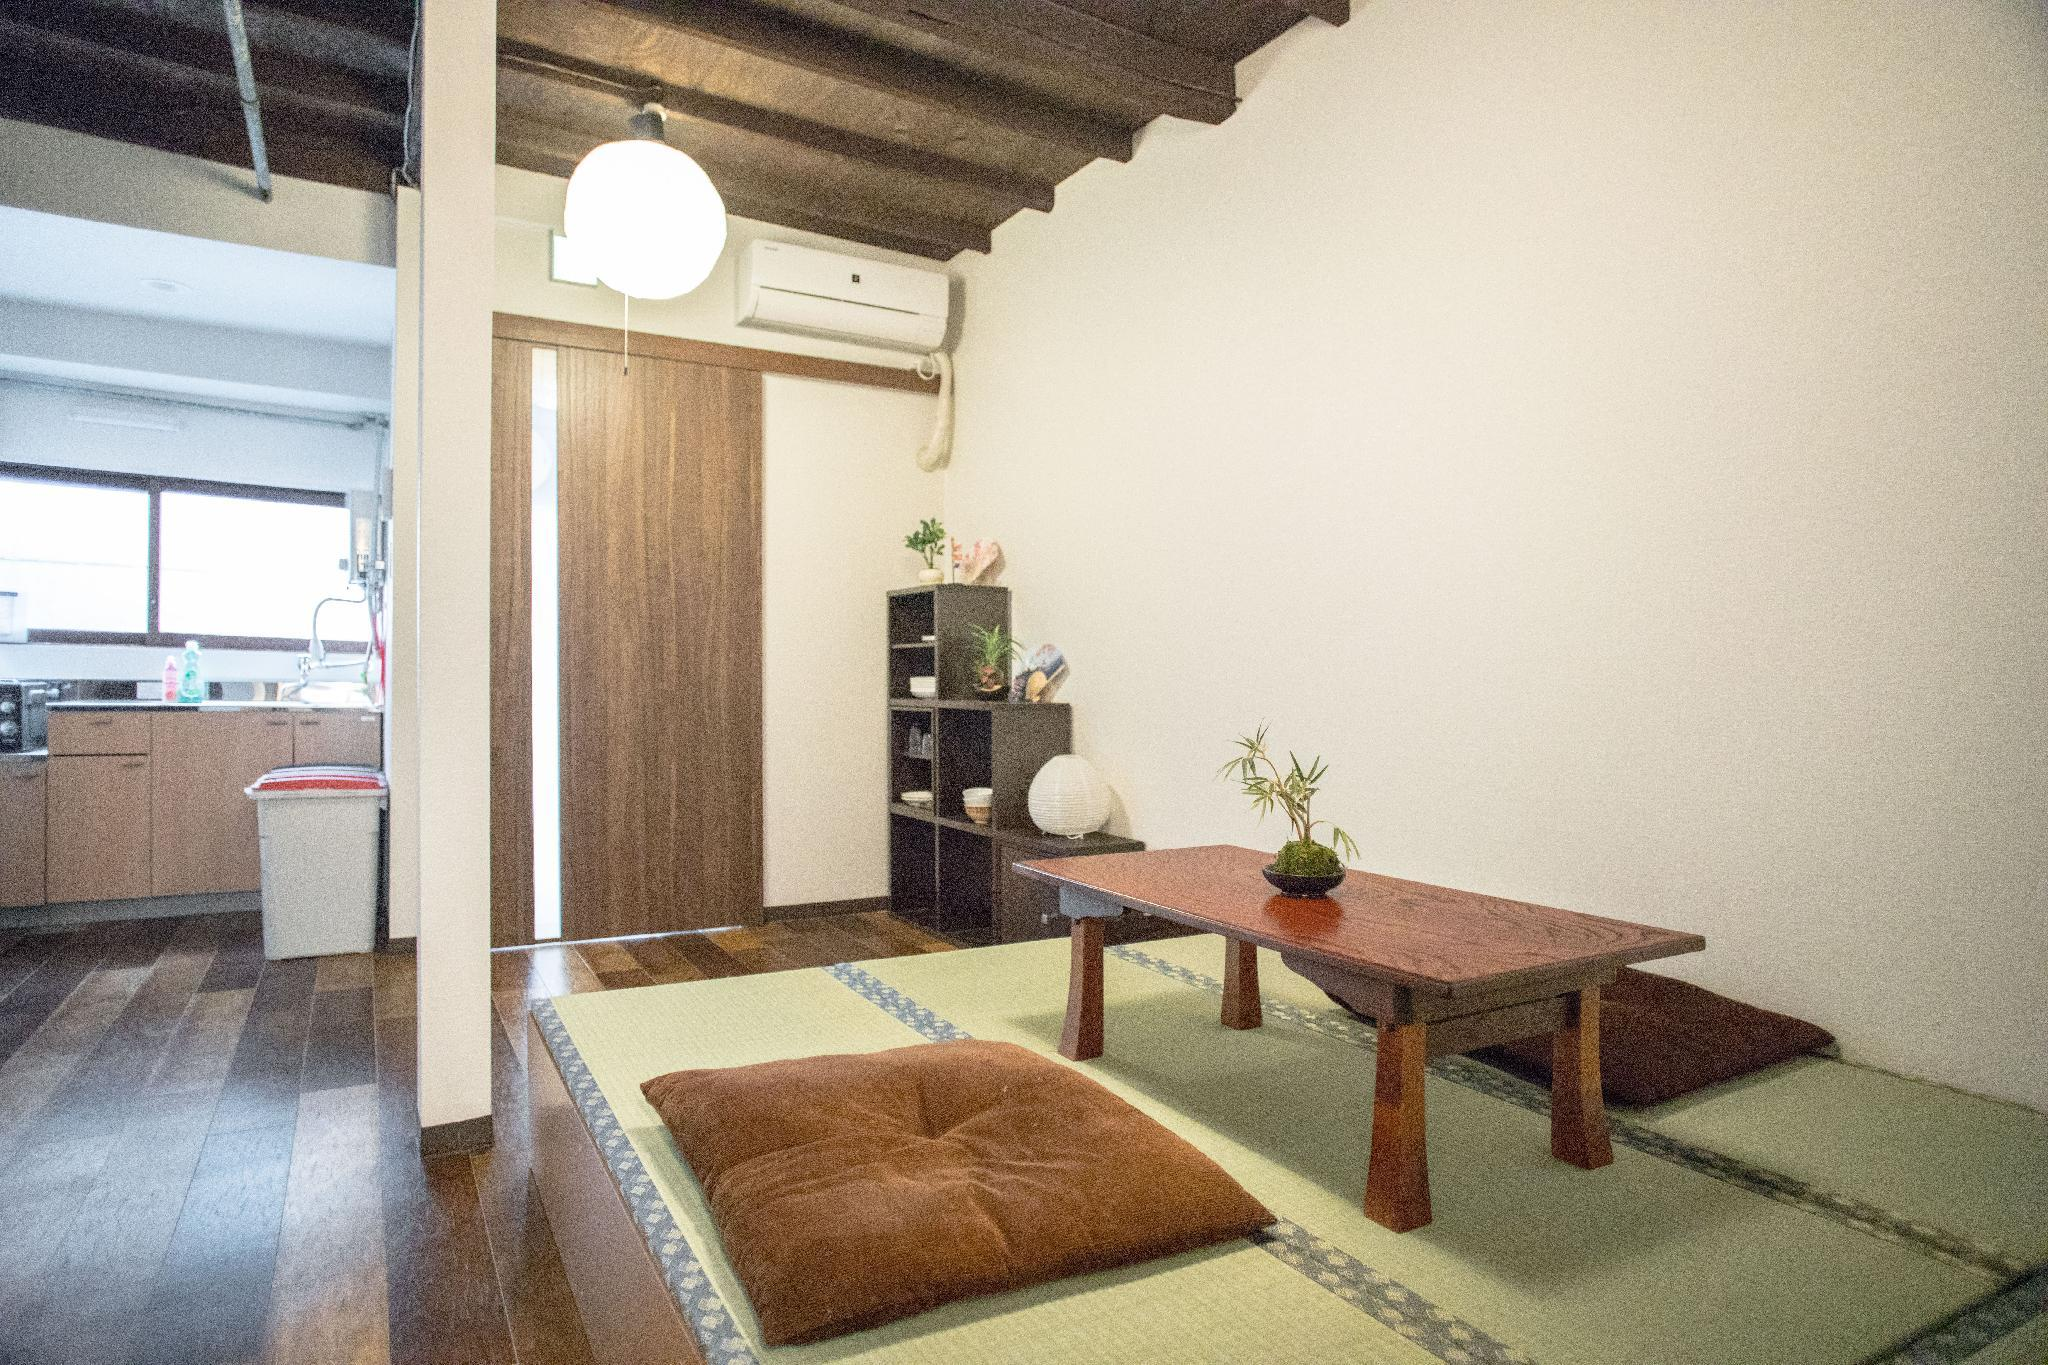 Modern Japanese House Everything In 10 Mins' Walk